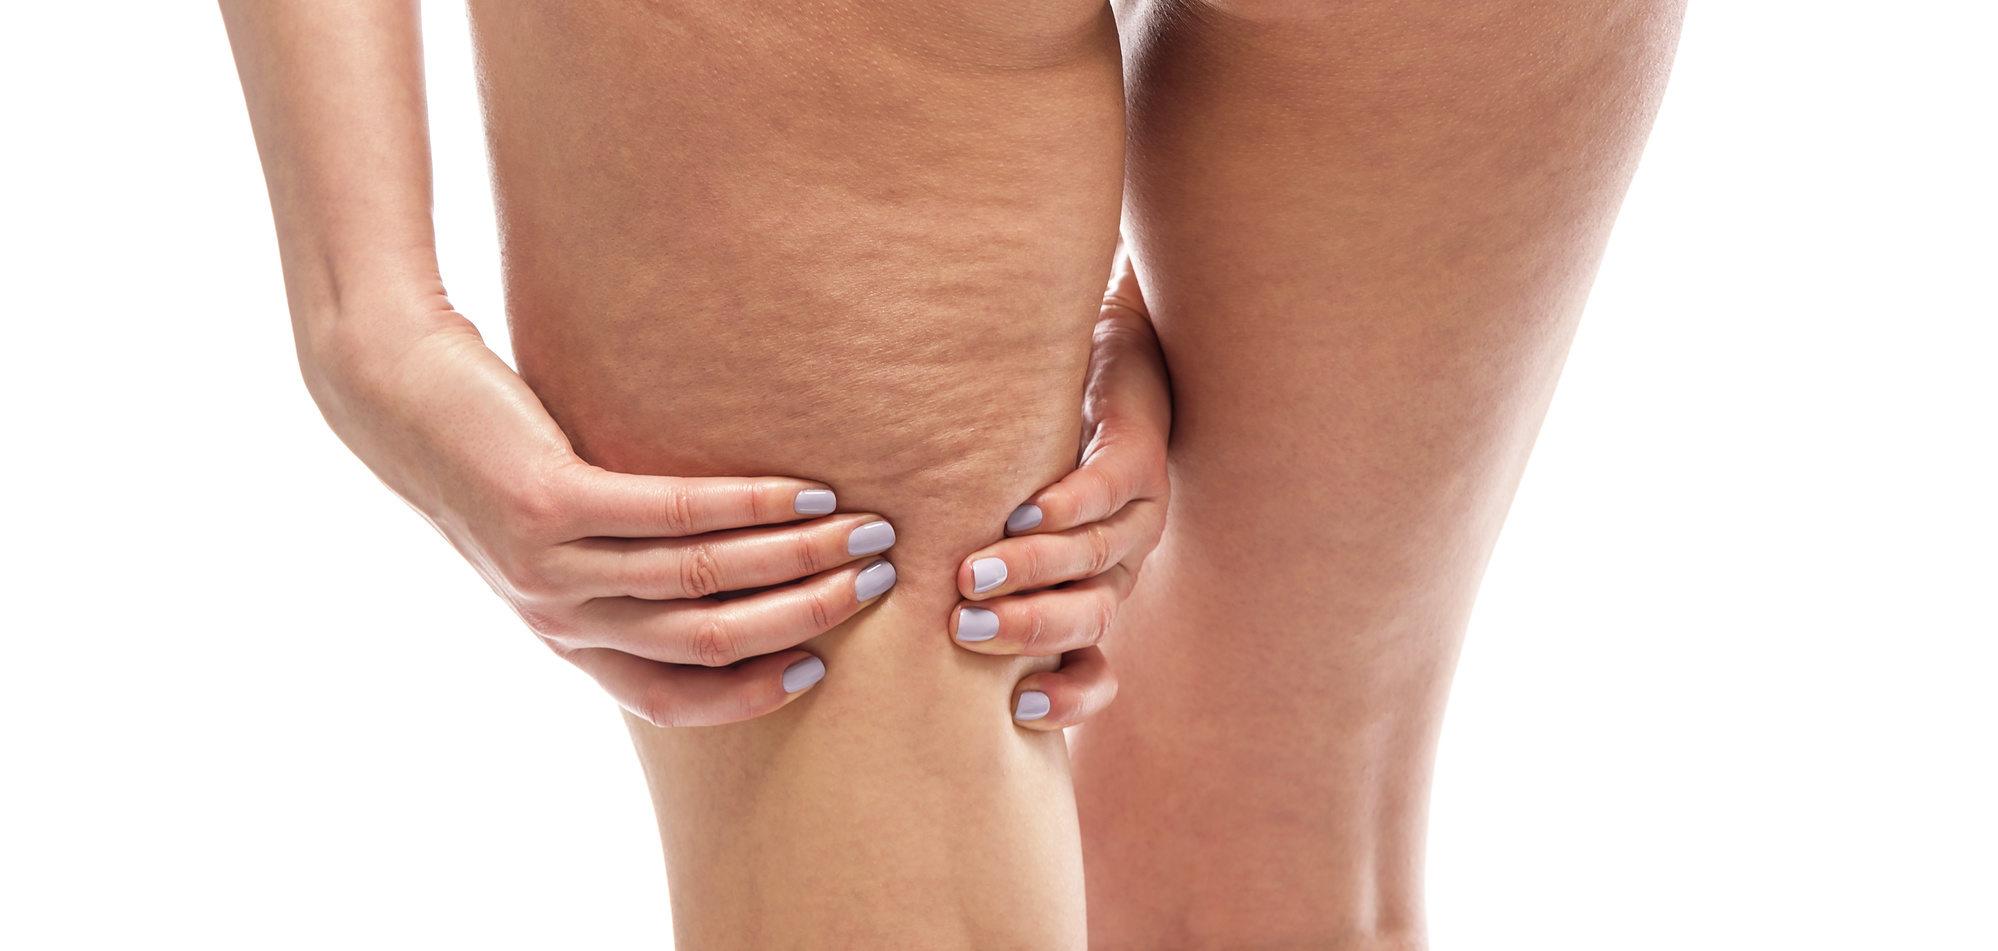 Cellulitis vrije zomer